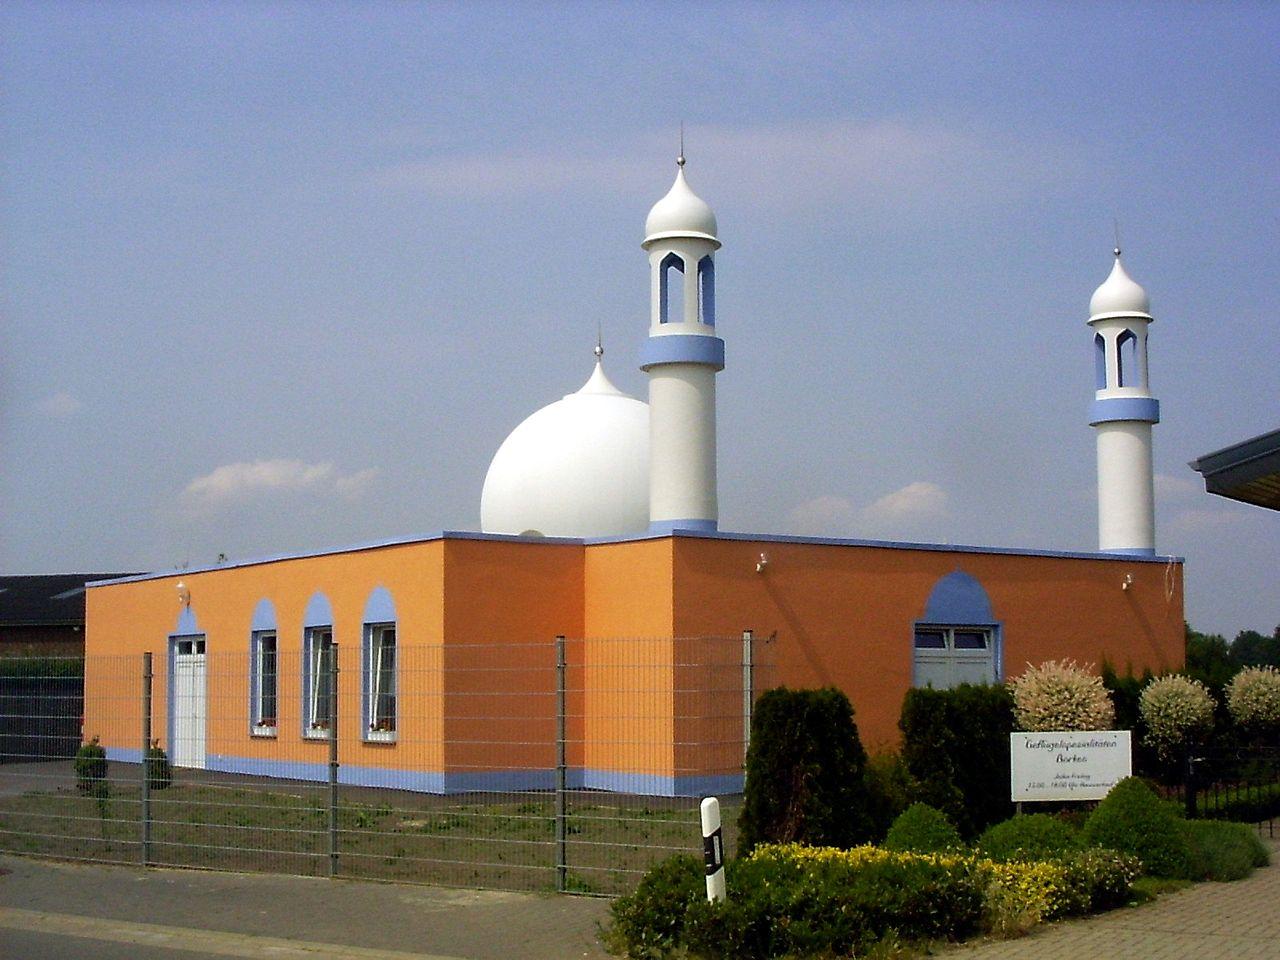 New Zealand Mosque Wikipedia: AHMADIYYA MOSQUE: April 2013